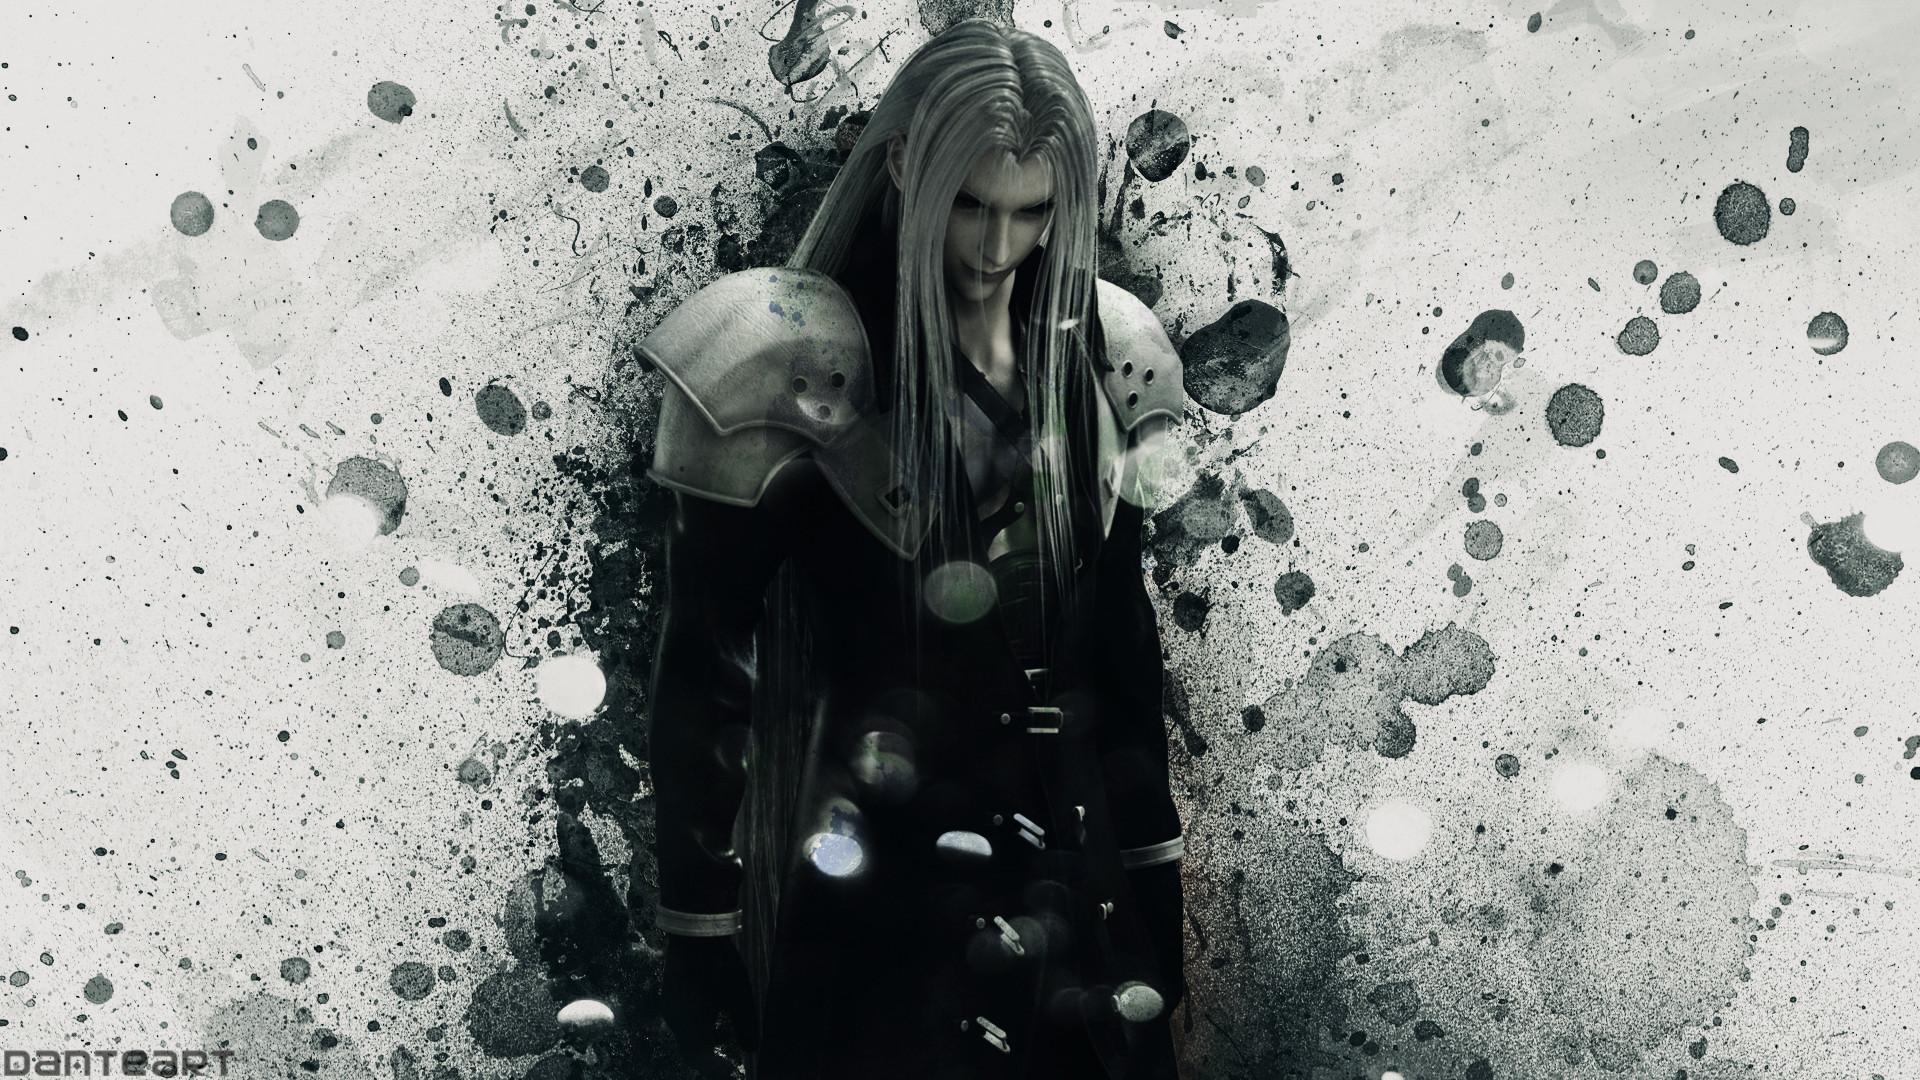 … DanteArtWallpapers Crisis Core Final Fantasy VII Sephiroth Wallpaper by  DanteArtWallpapers